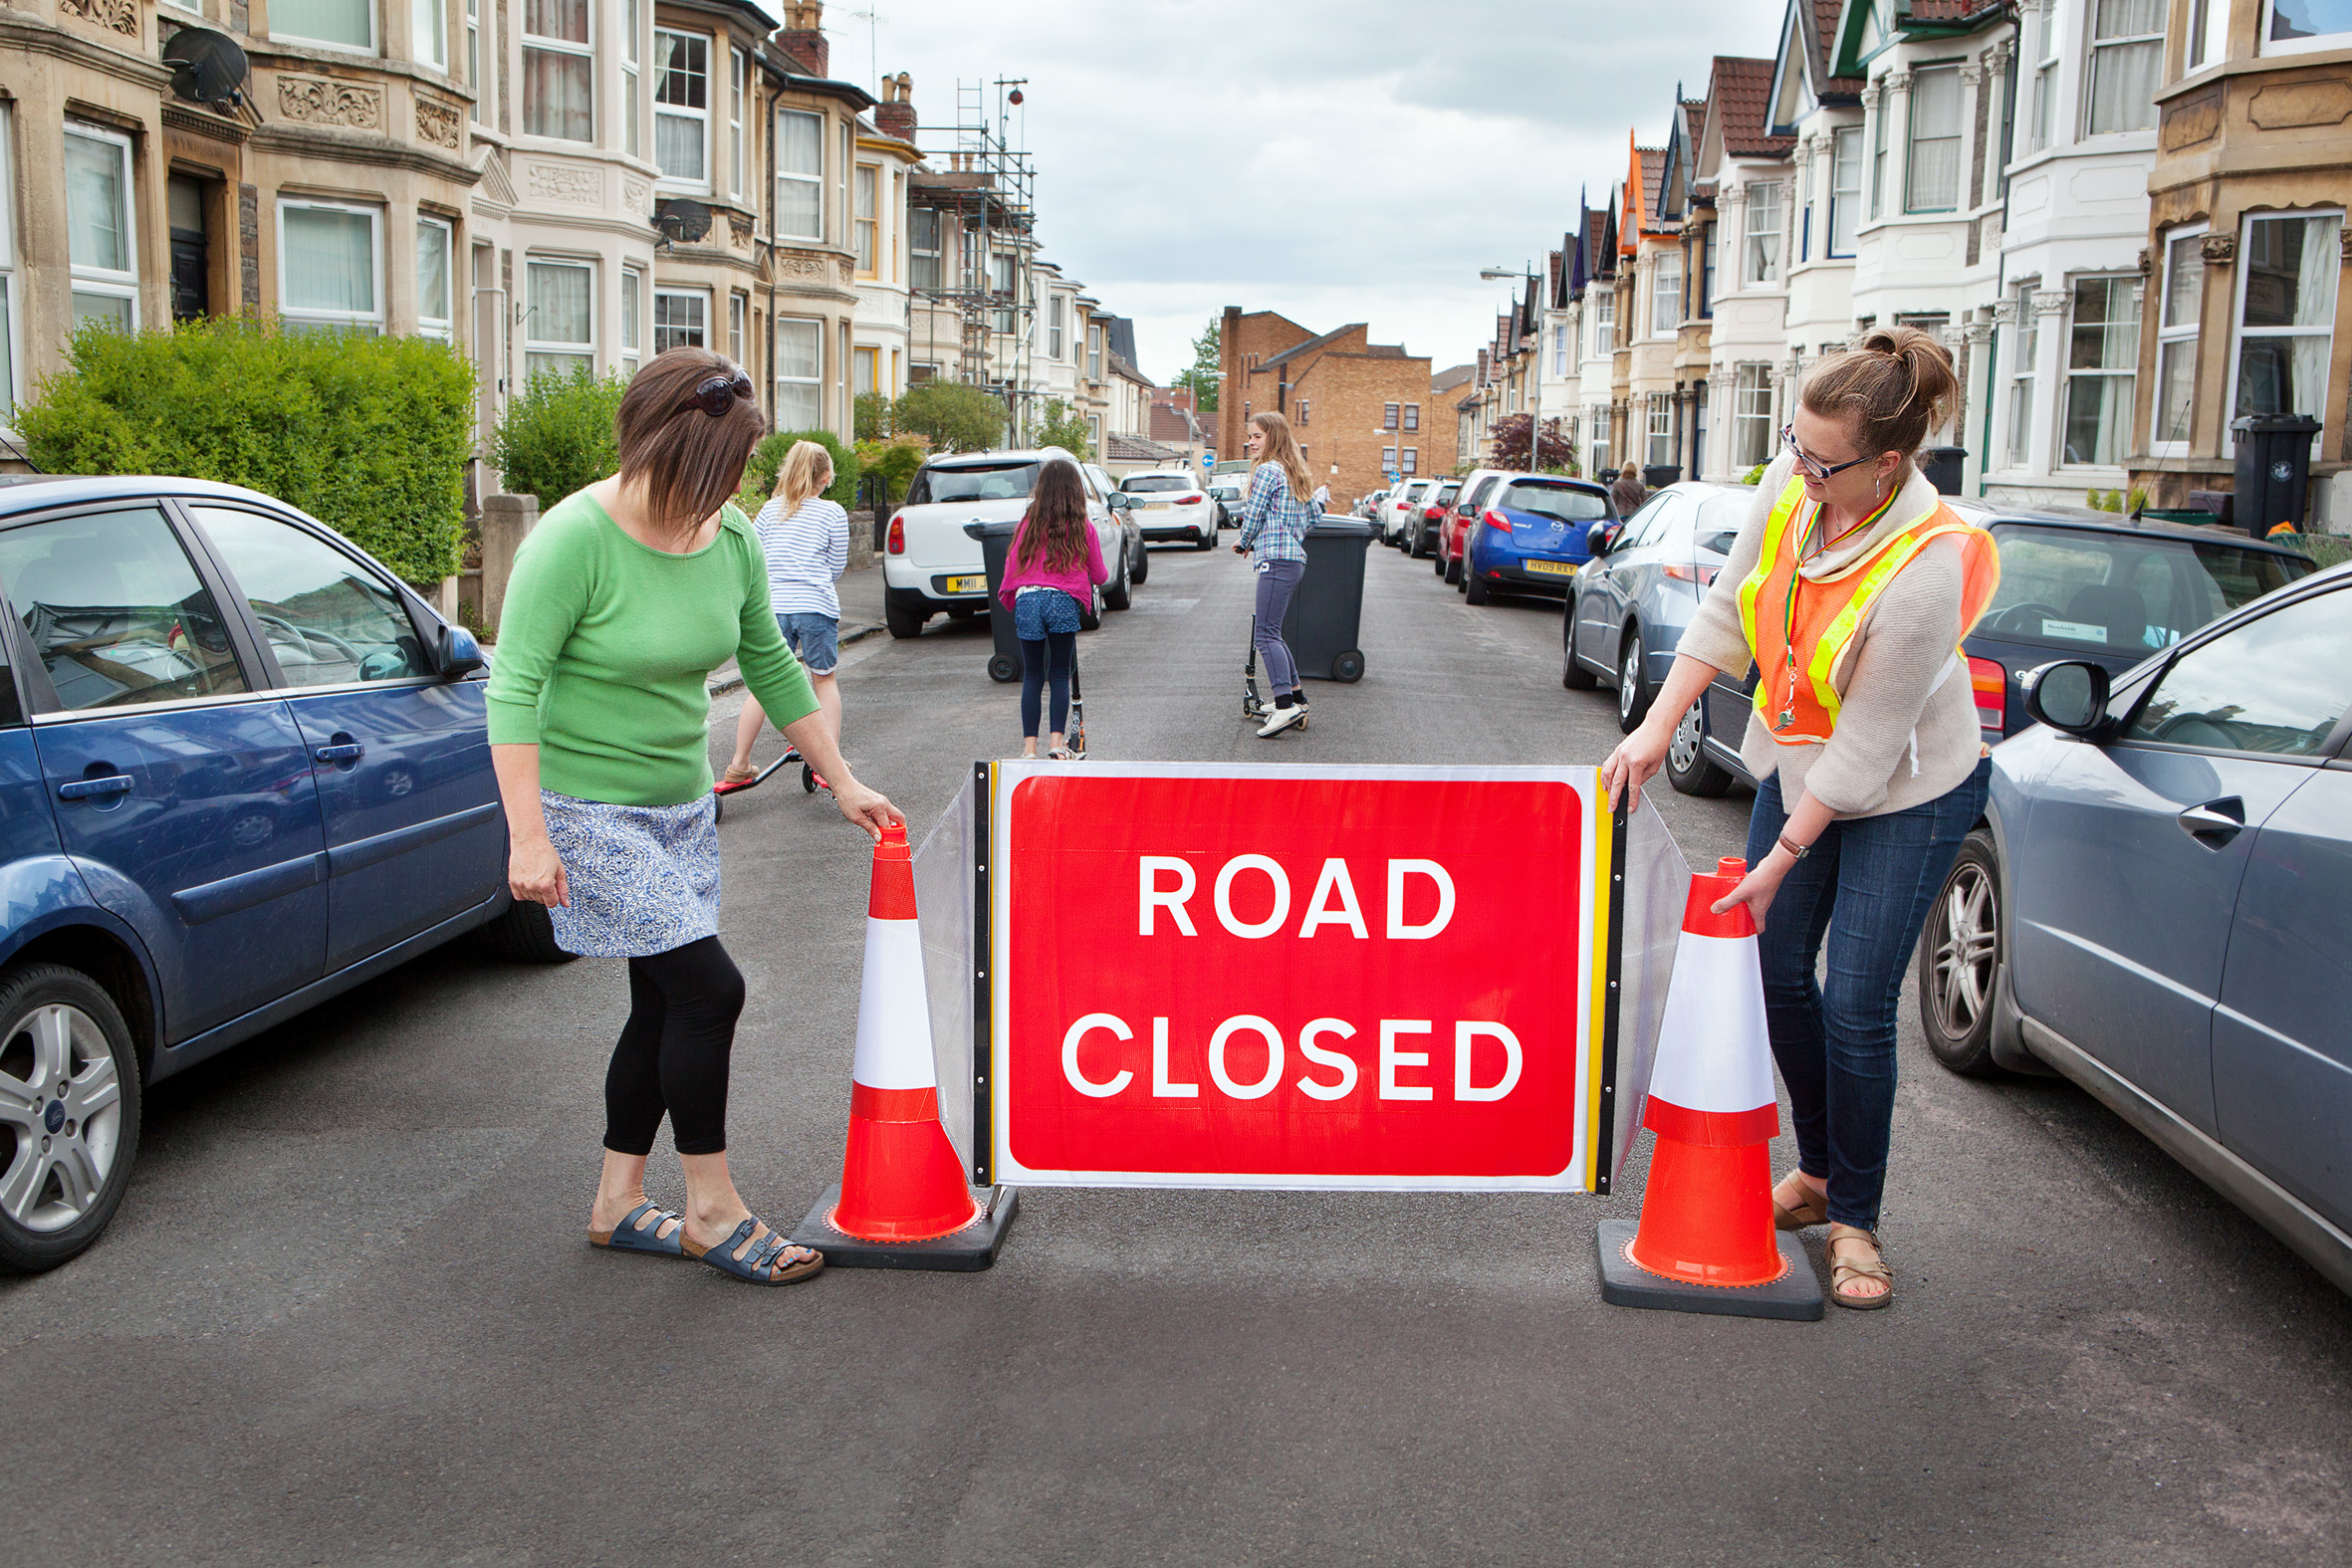 Stewards closing the road